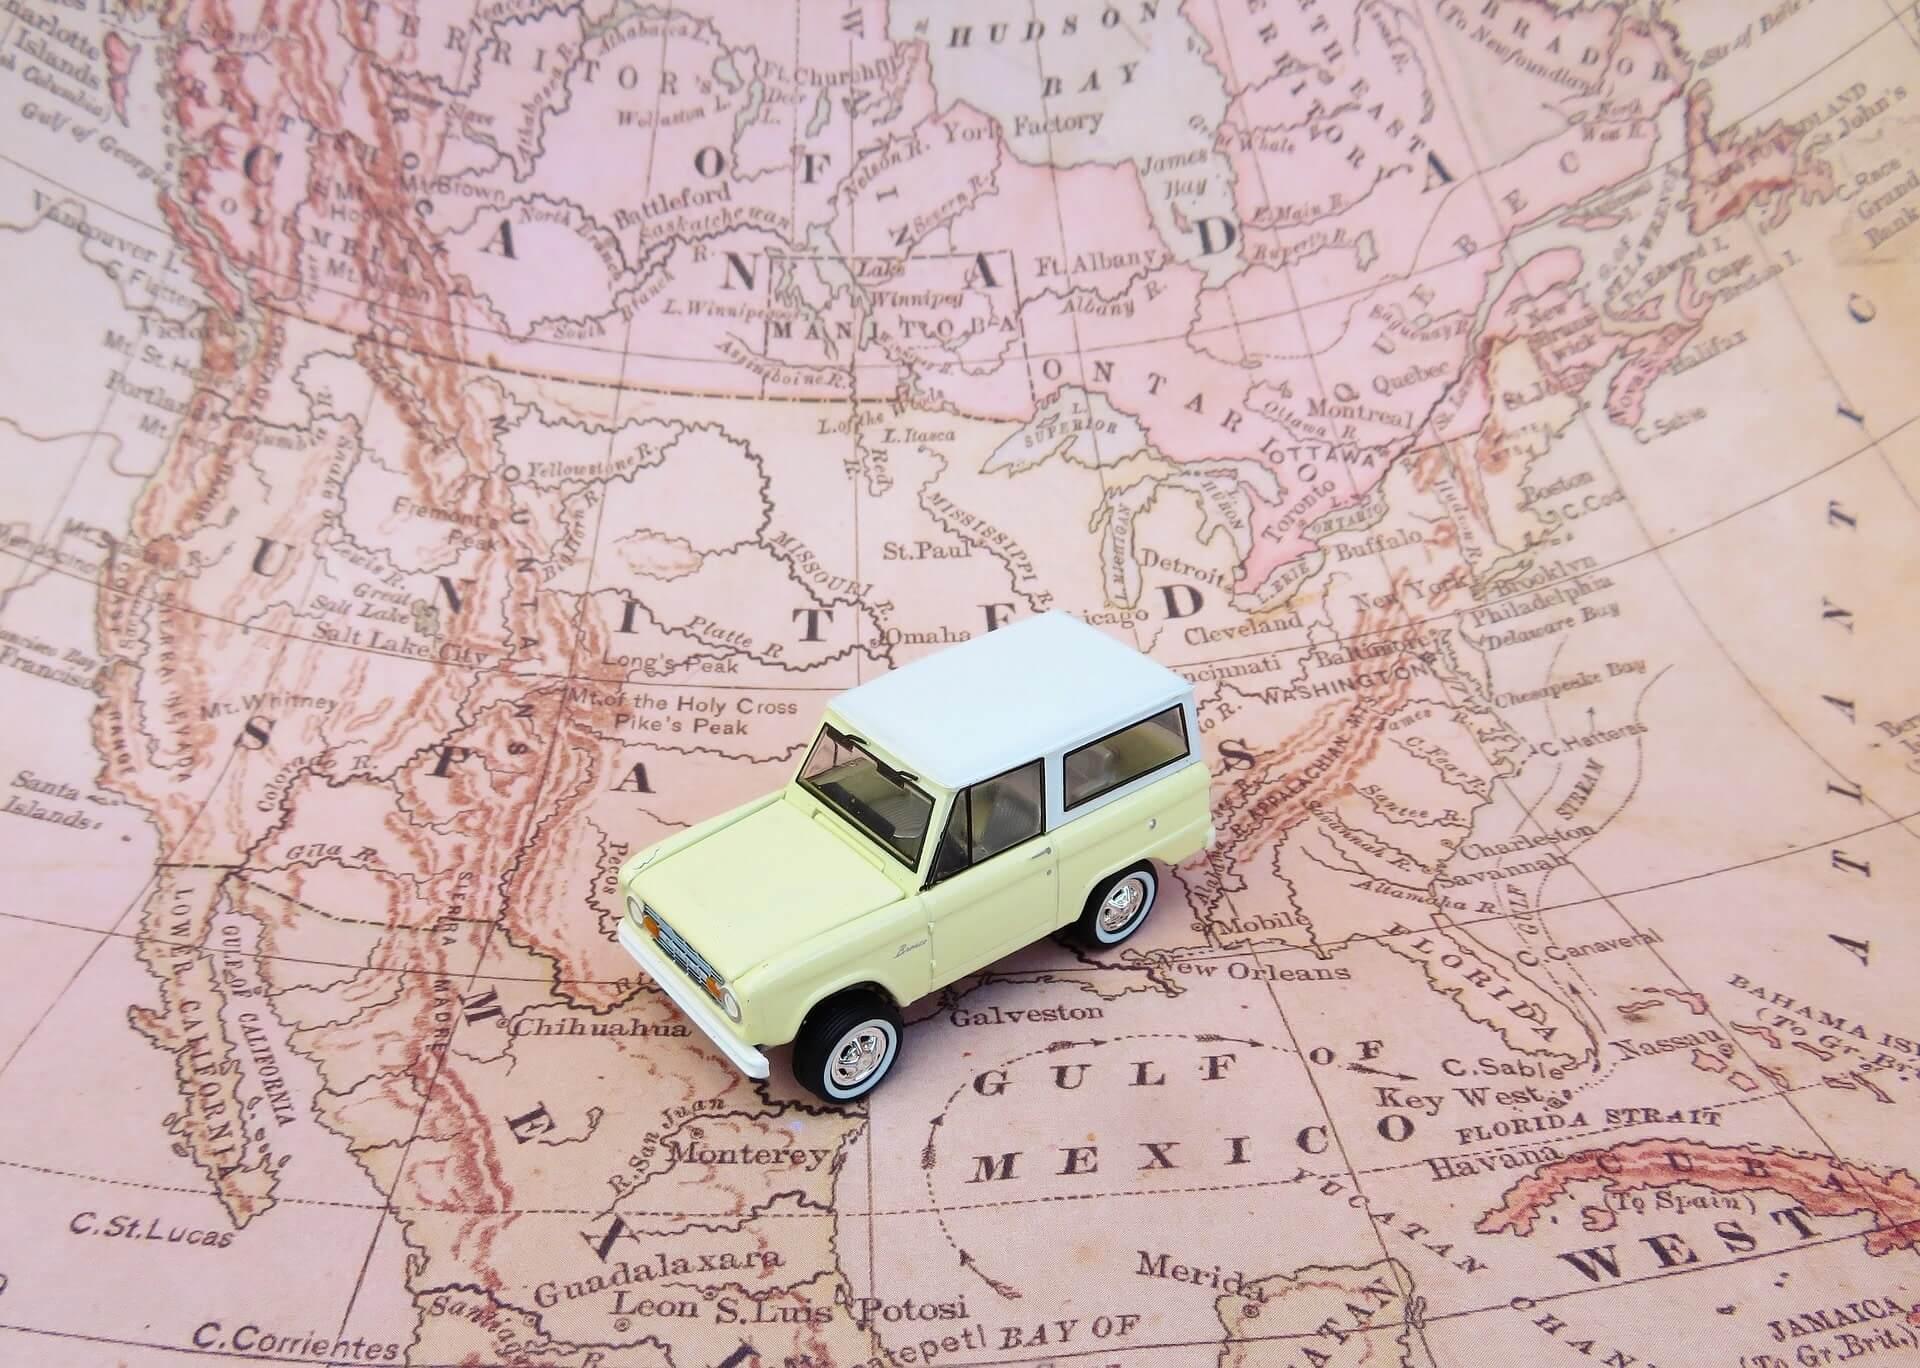 , 2019's Best Summer Travel Destinations: Planning perfect summer getaway, Buzz travel | eTurboNews |Travel News